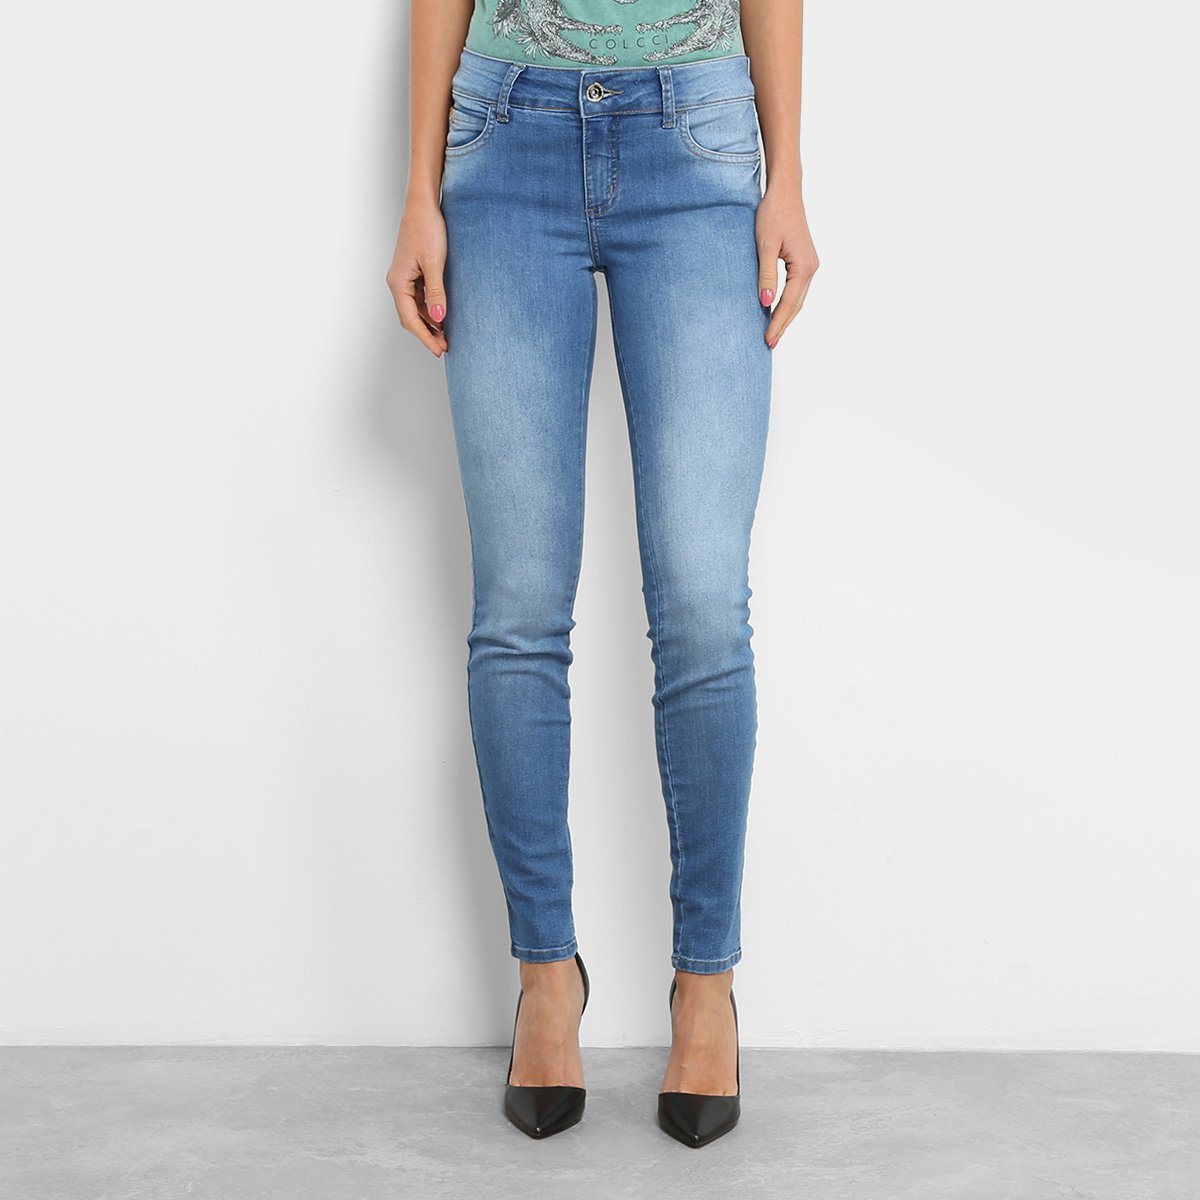 1525921d6 Calça Jeans Skinny Colcci Base Fátima Lavagem Estonada Cintura Média ...